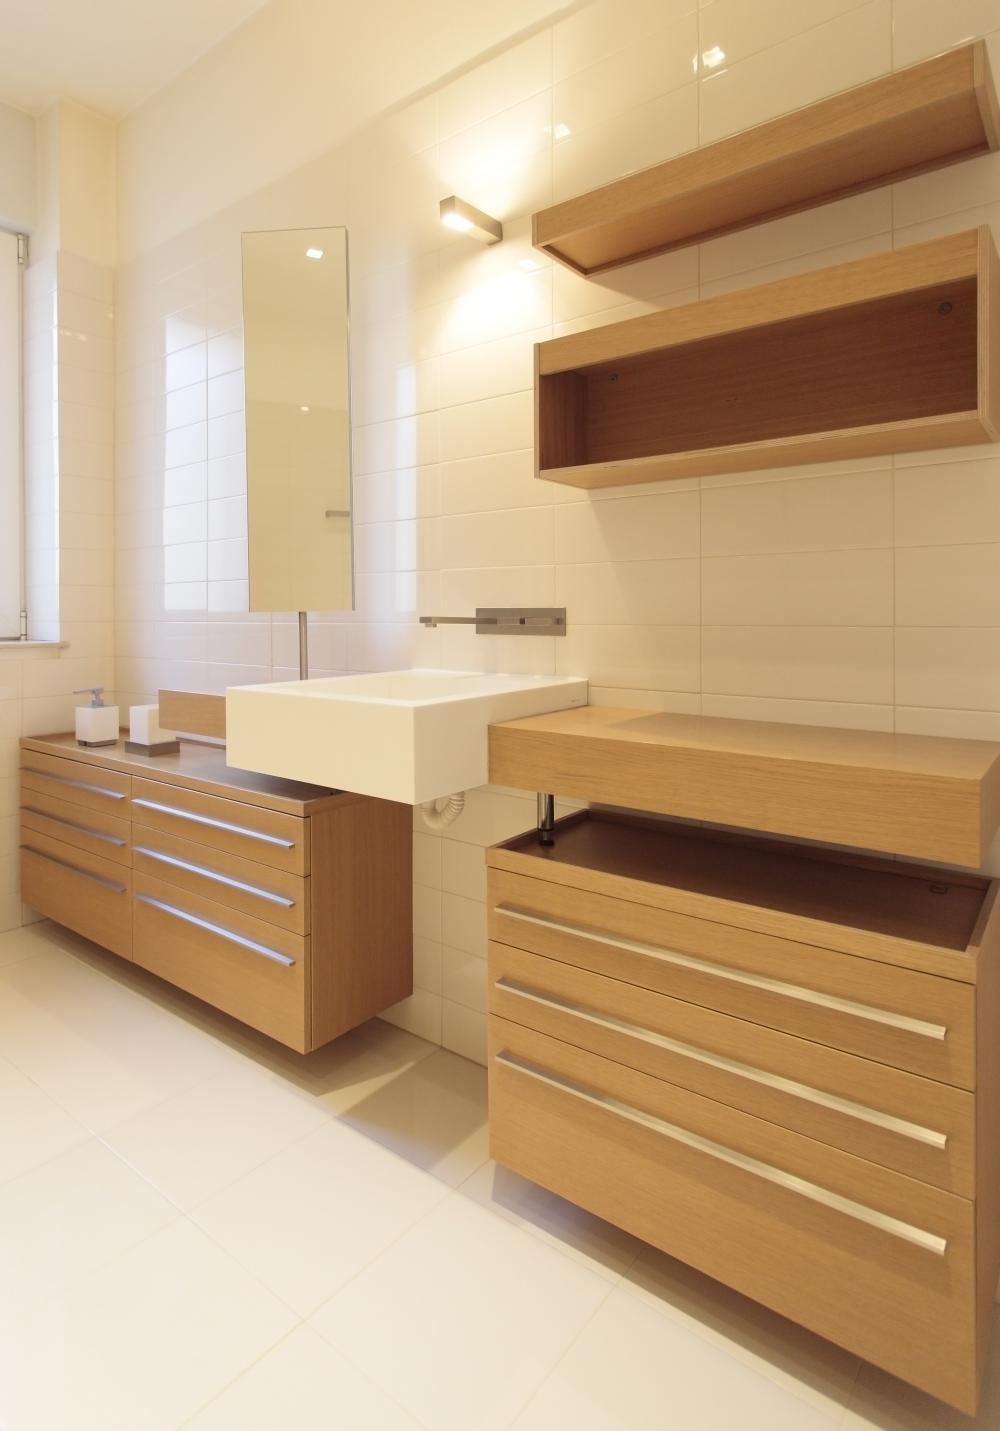 https://nbc-arhitect.ro/wp-content/uploads/2020/10/NBC-Arhitect-_-Cube-House-_-Bucharest-Romania-_-interior-view-bathroom_9.jpg